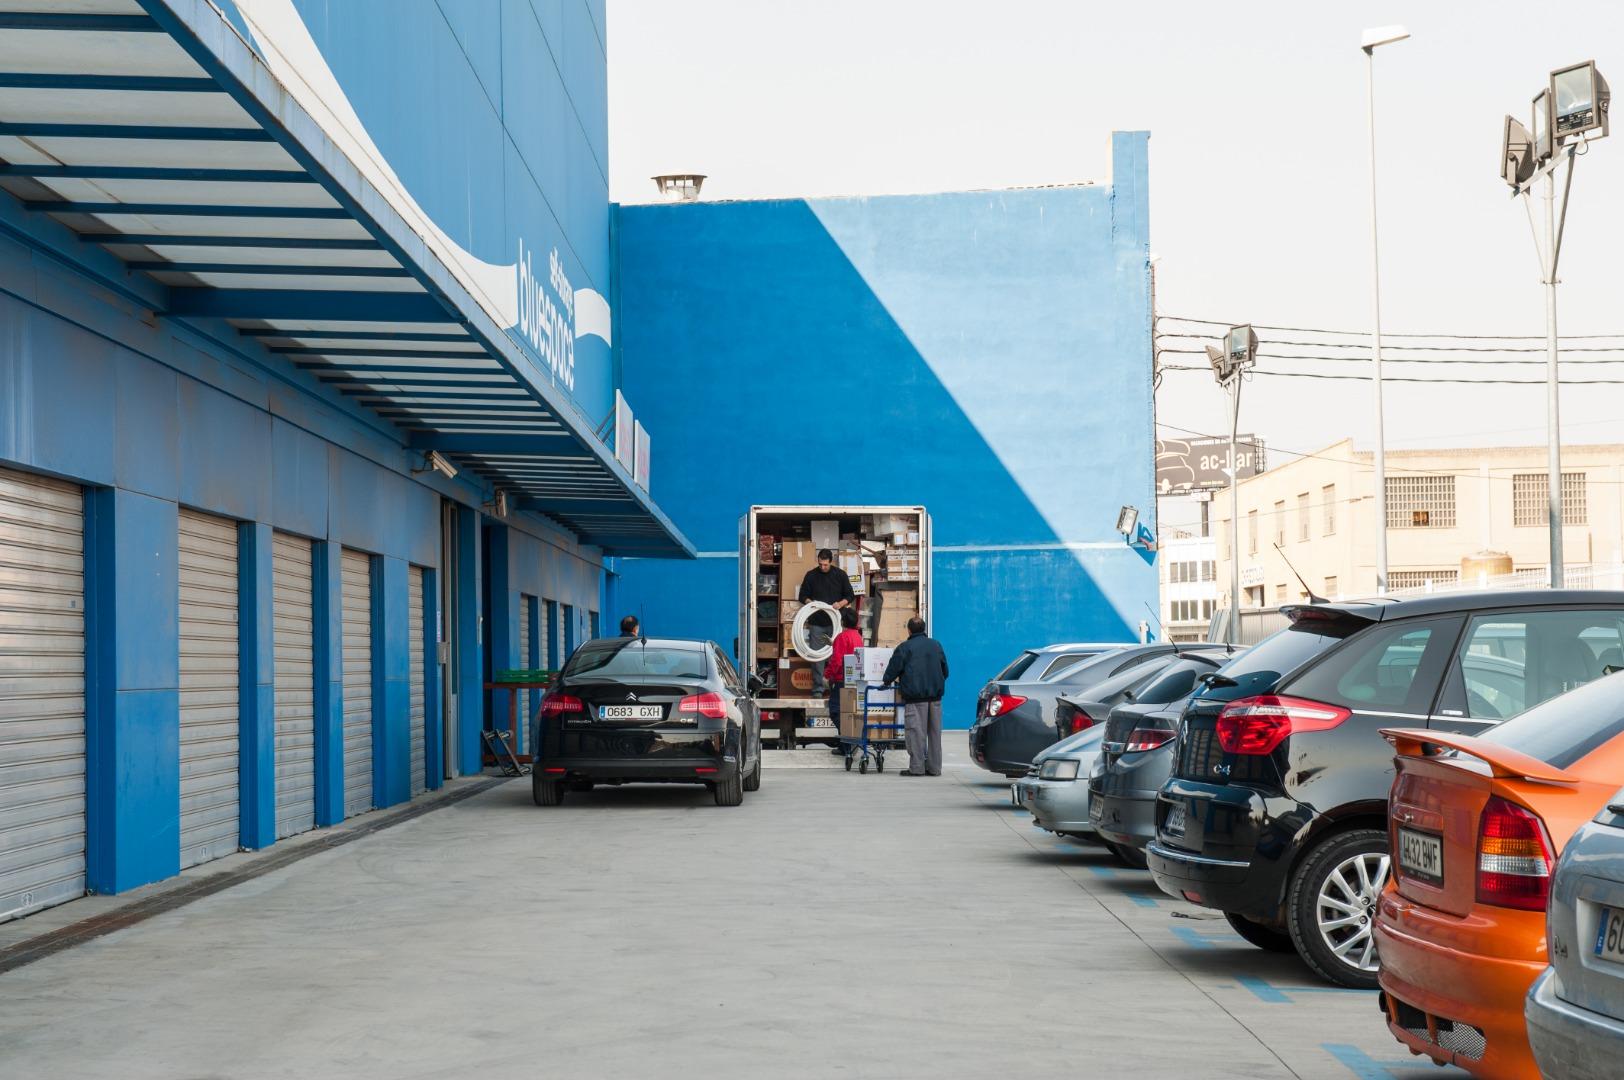 Lloguer Magatzem  Bajo vinalopó, 1. Trasteros bluespace de 60 m2 en mislata (valencia). tenemos dife